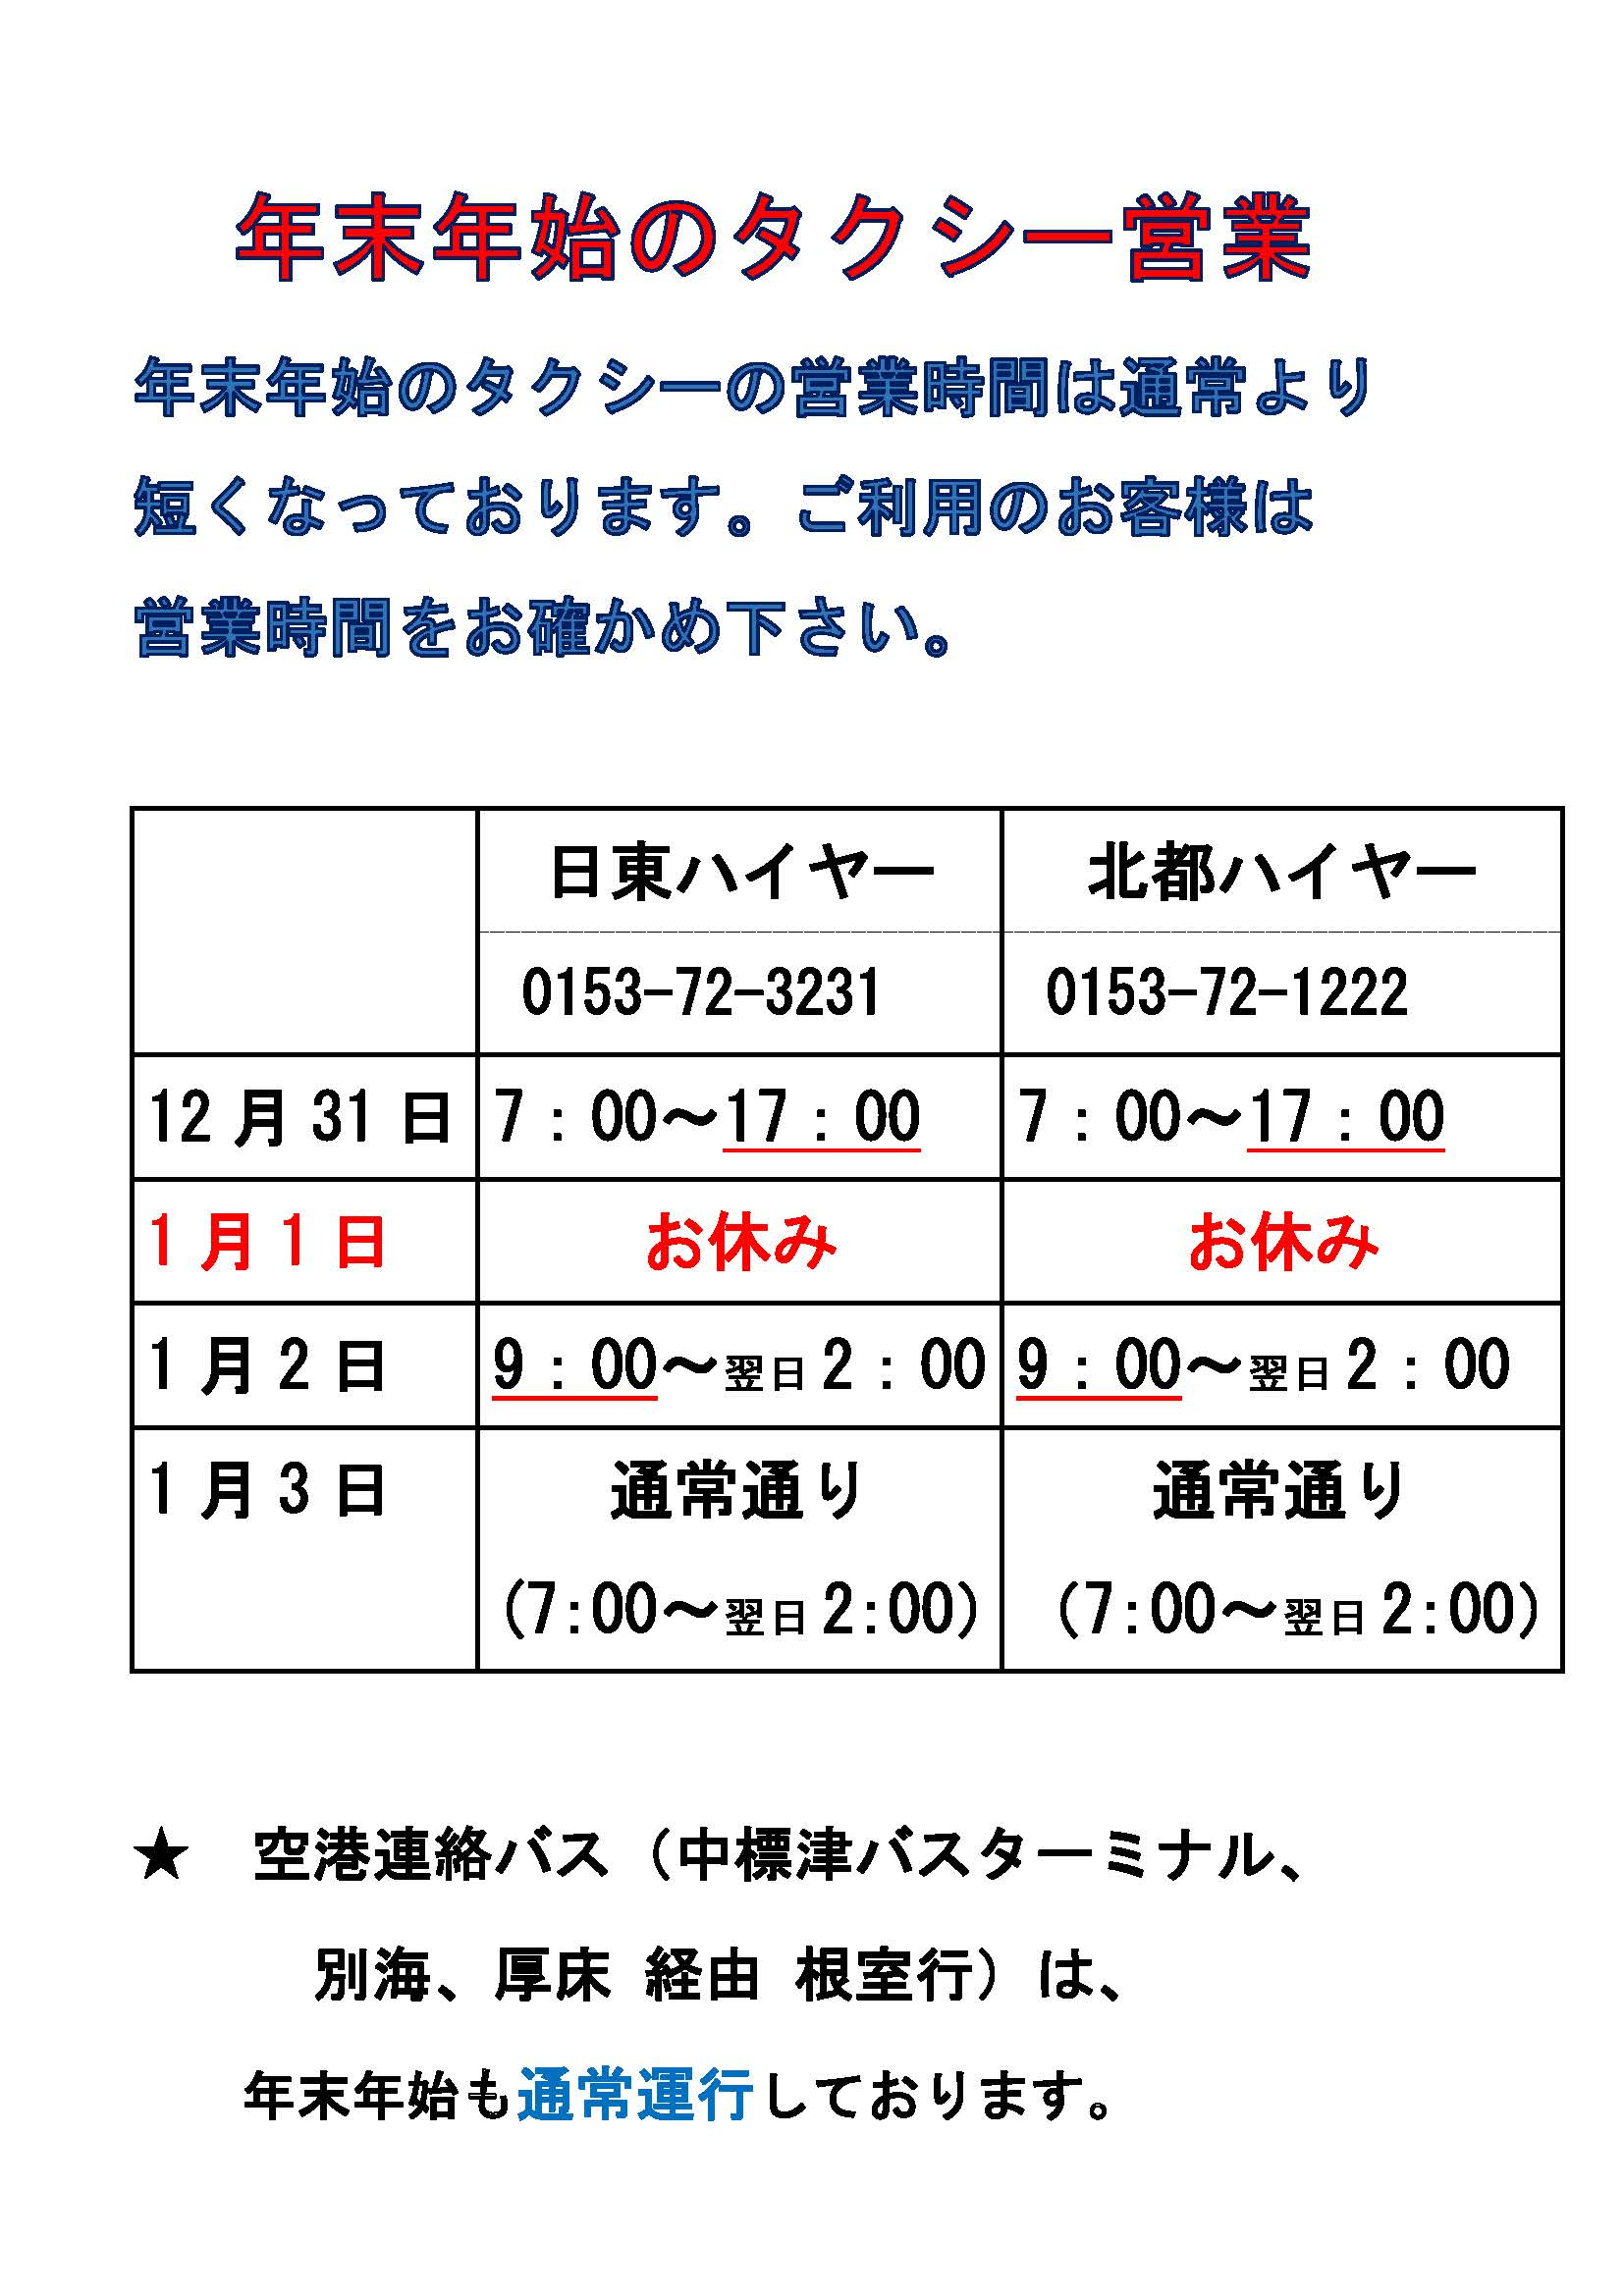 http://www.nakashibetsu-airport.jp/%E5%B9%B4%E6%9C%AB%E5%B9%B4%E5%A7%8B%E3%81%AE%E3%83%8F%E3%82%A4%E3%83%A4%E3%83%BC%E5%96%B6%E6%A5%AD%E3%81%AB%E3%81%A4%E3%81%84%E3%81%A6%20-%20%E3%82%B3%E3%83%94%E3%83%BC%20%E6%96%B0.jpg